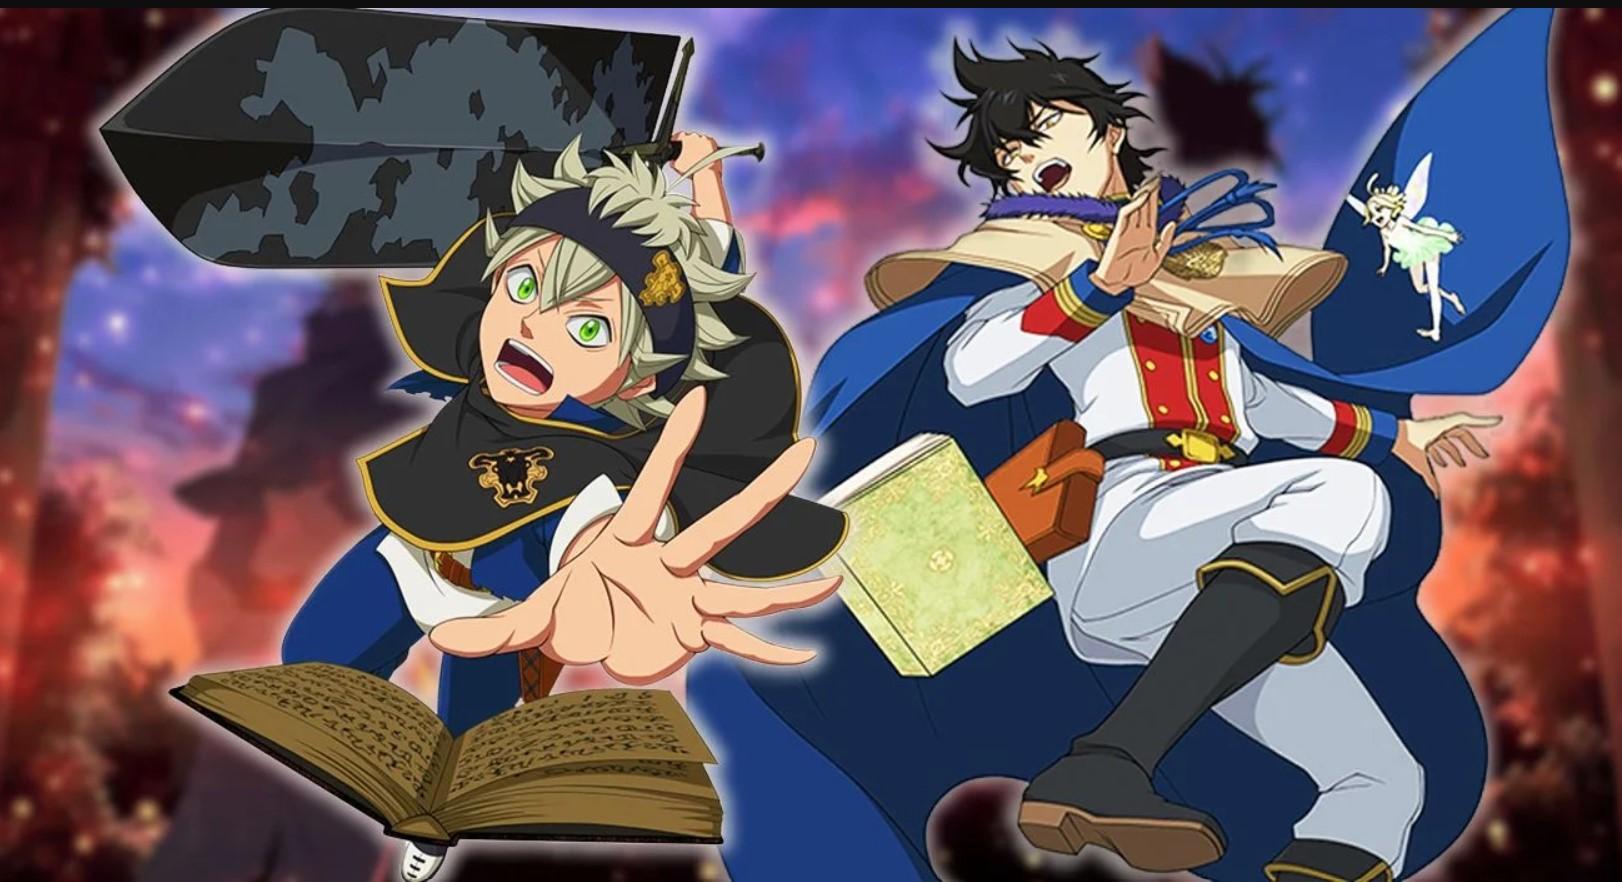 Anime like Haikyuu!